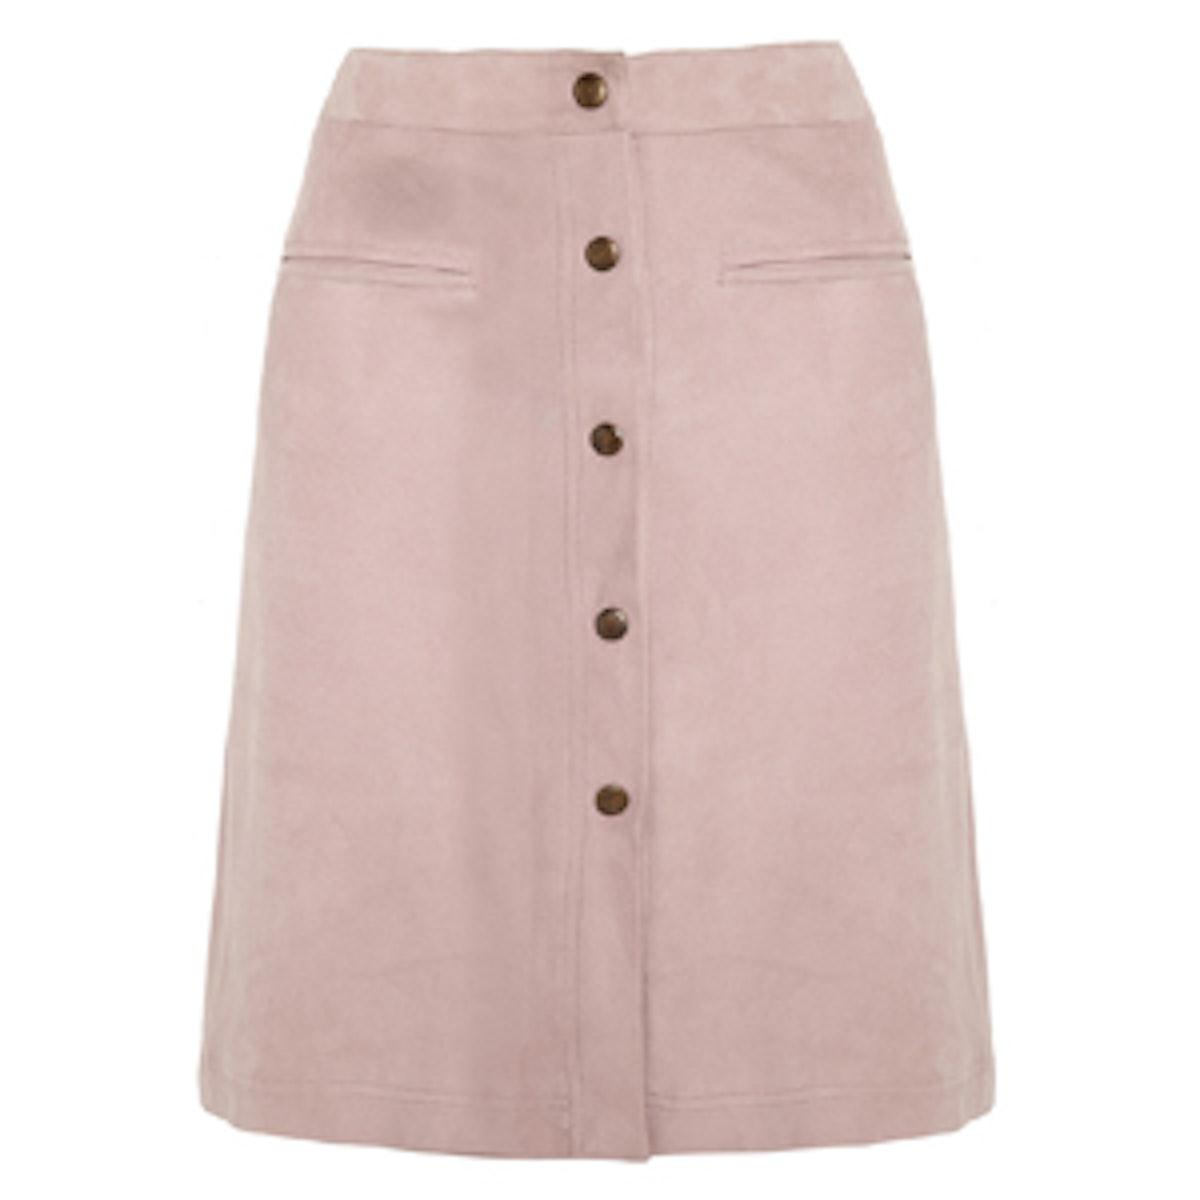 Pastel Suede Skirt